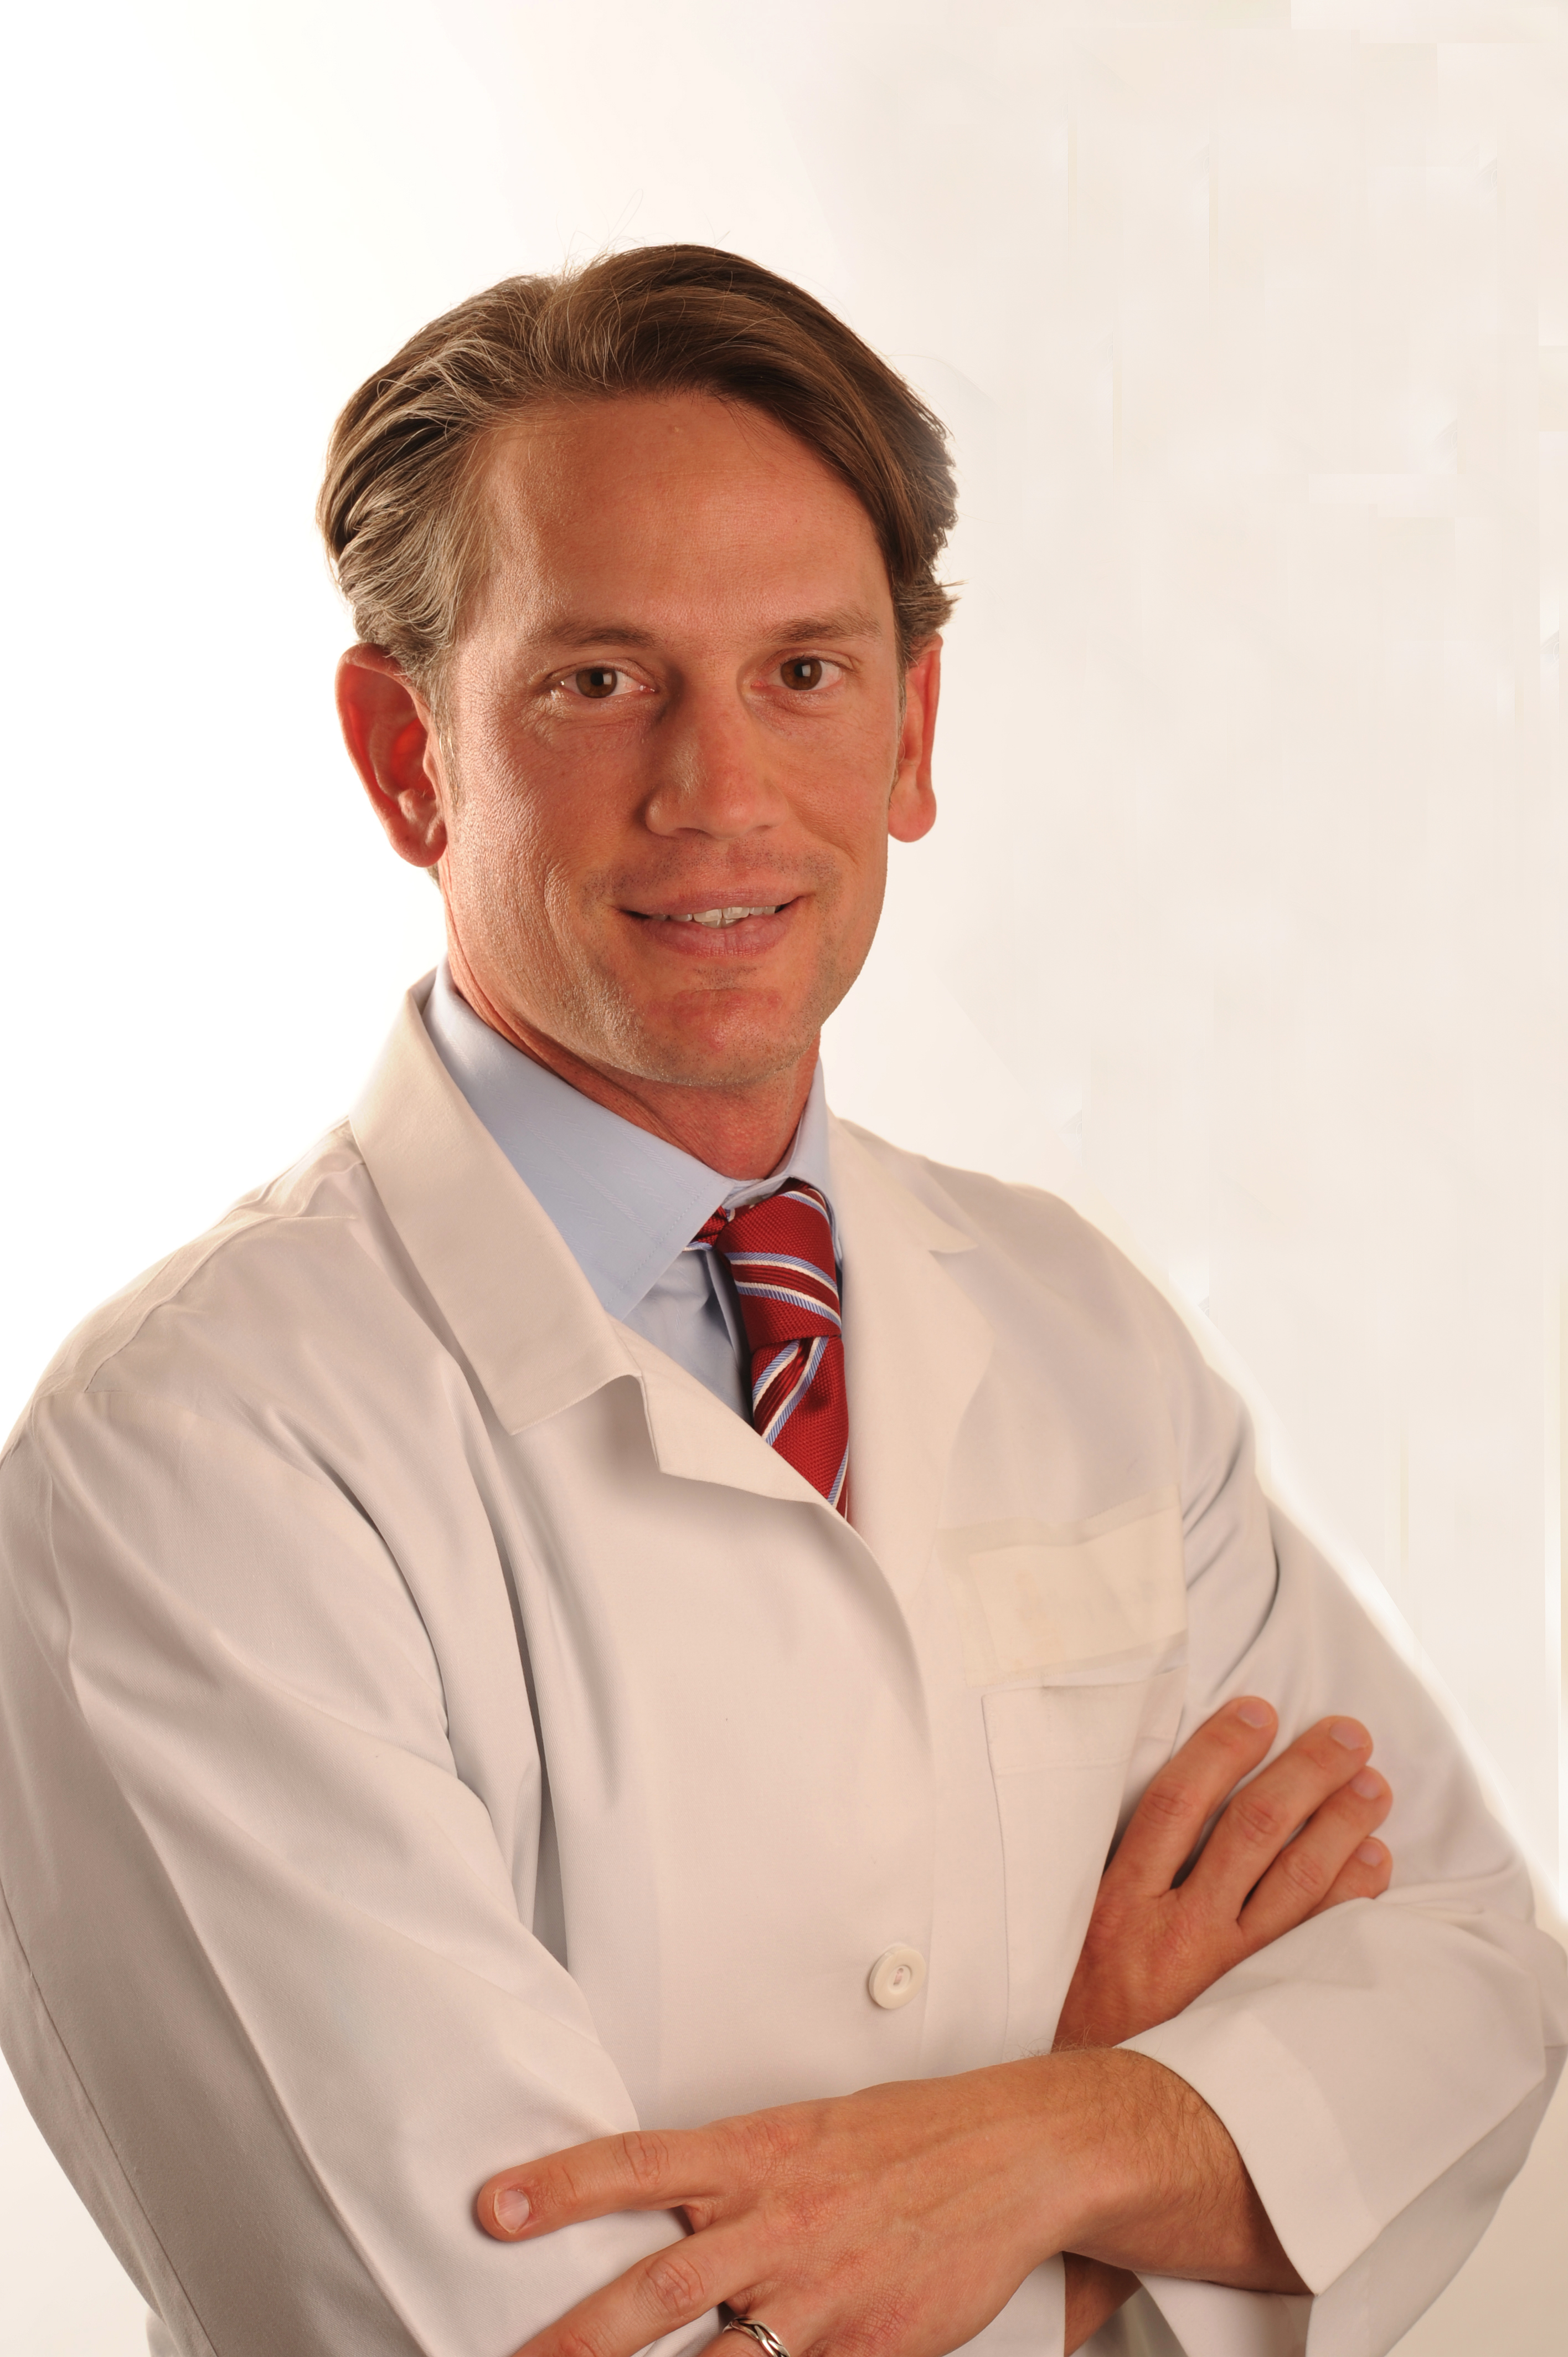 Alexander G. Moore, M.D.